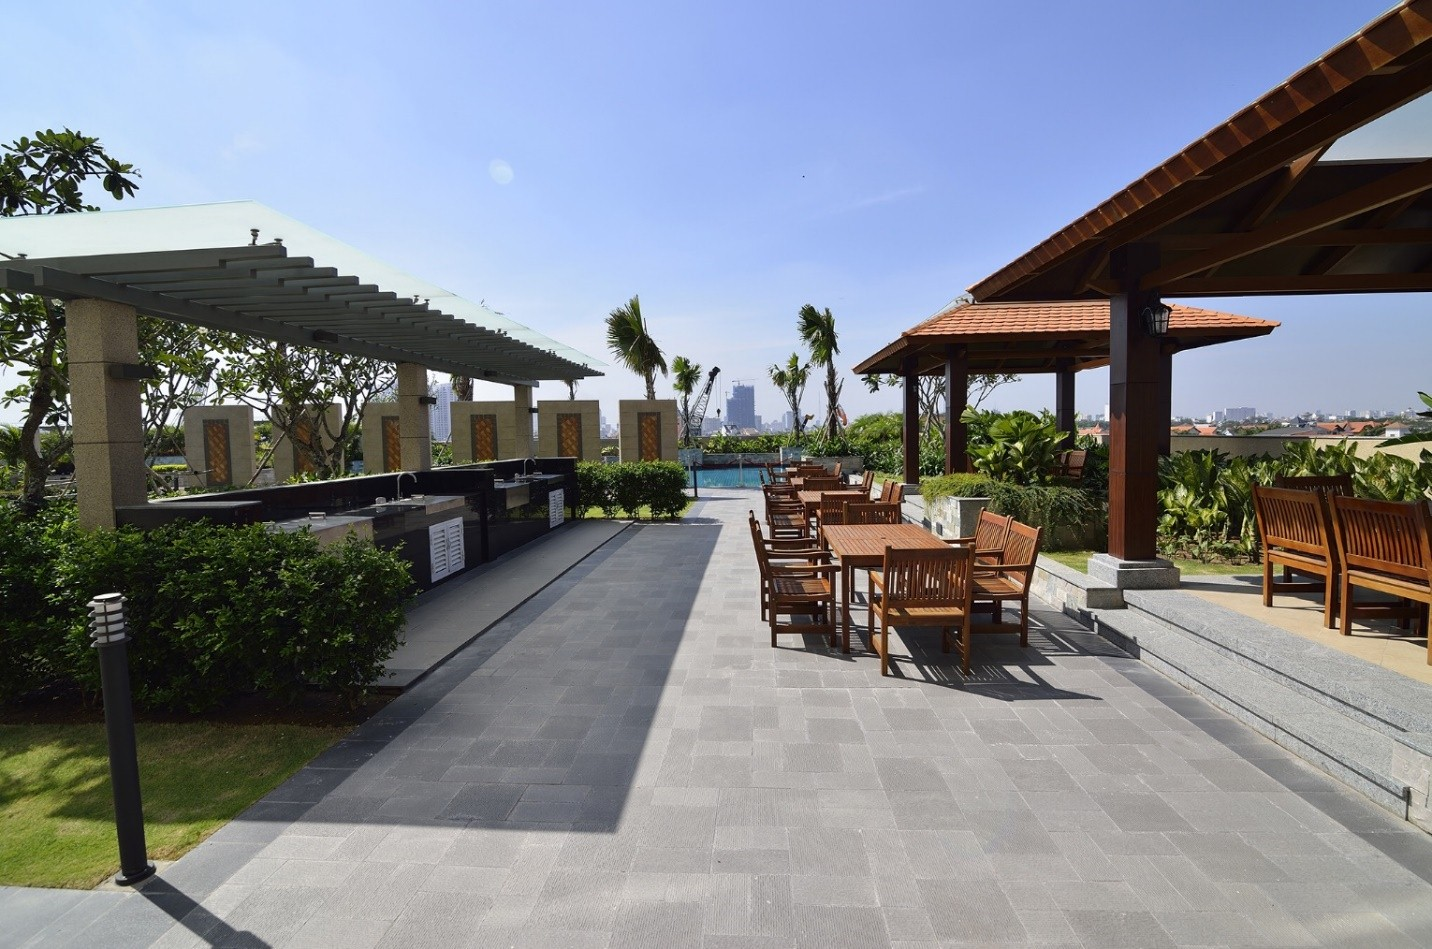 Dự án RichStar Quận Tân Phú